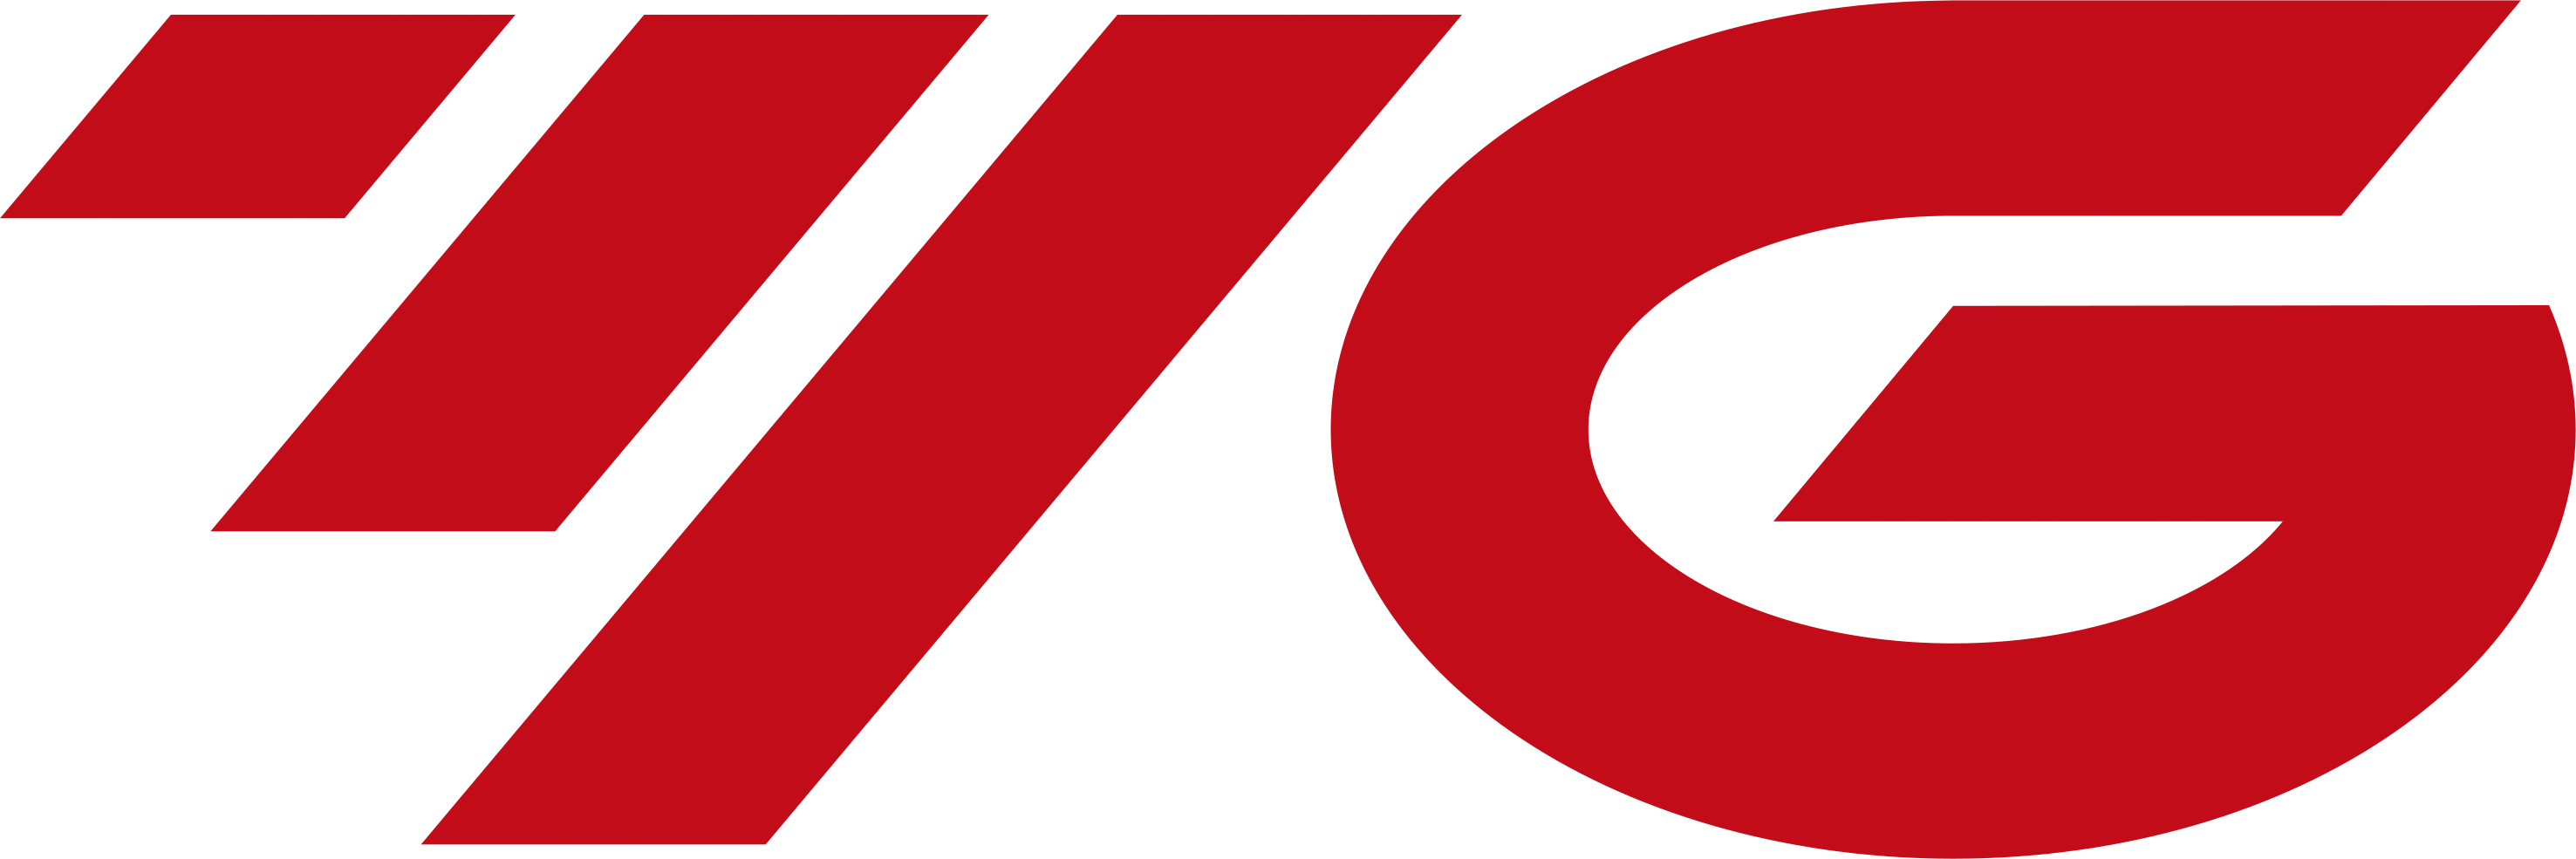 LOGO YG1 - OUTILS COUPANTS